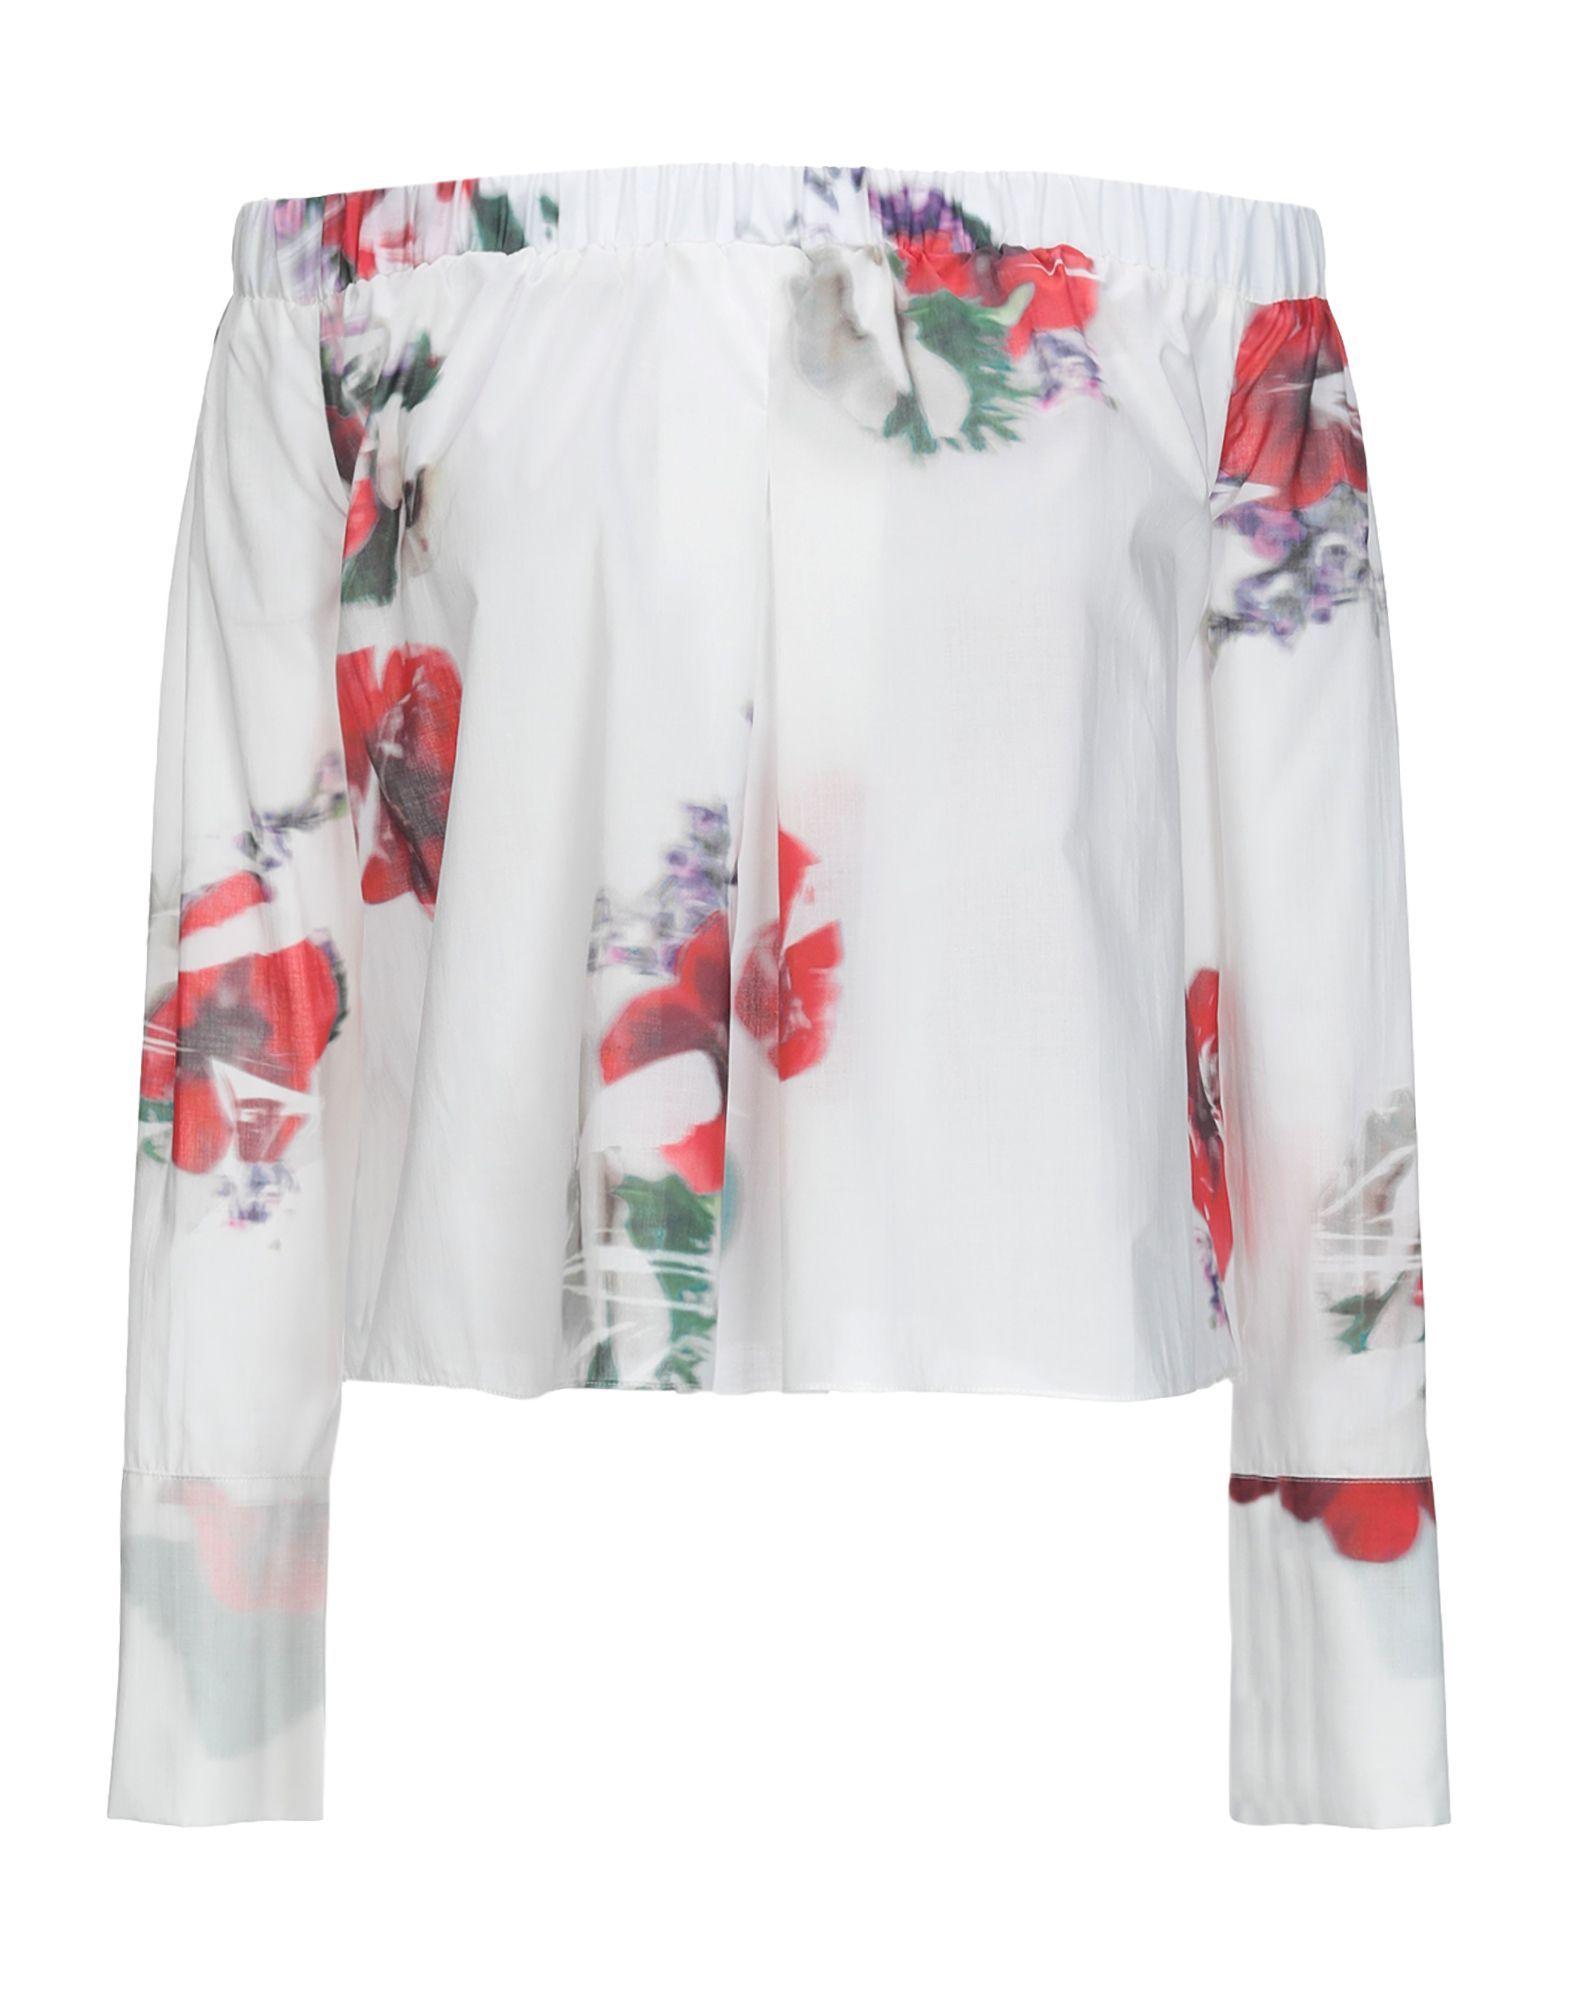 Cacharel White Floral Print Cotton Off The Shoulder Blouse